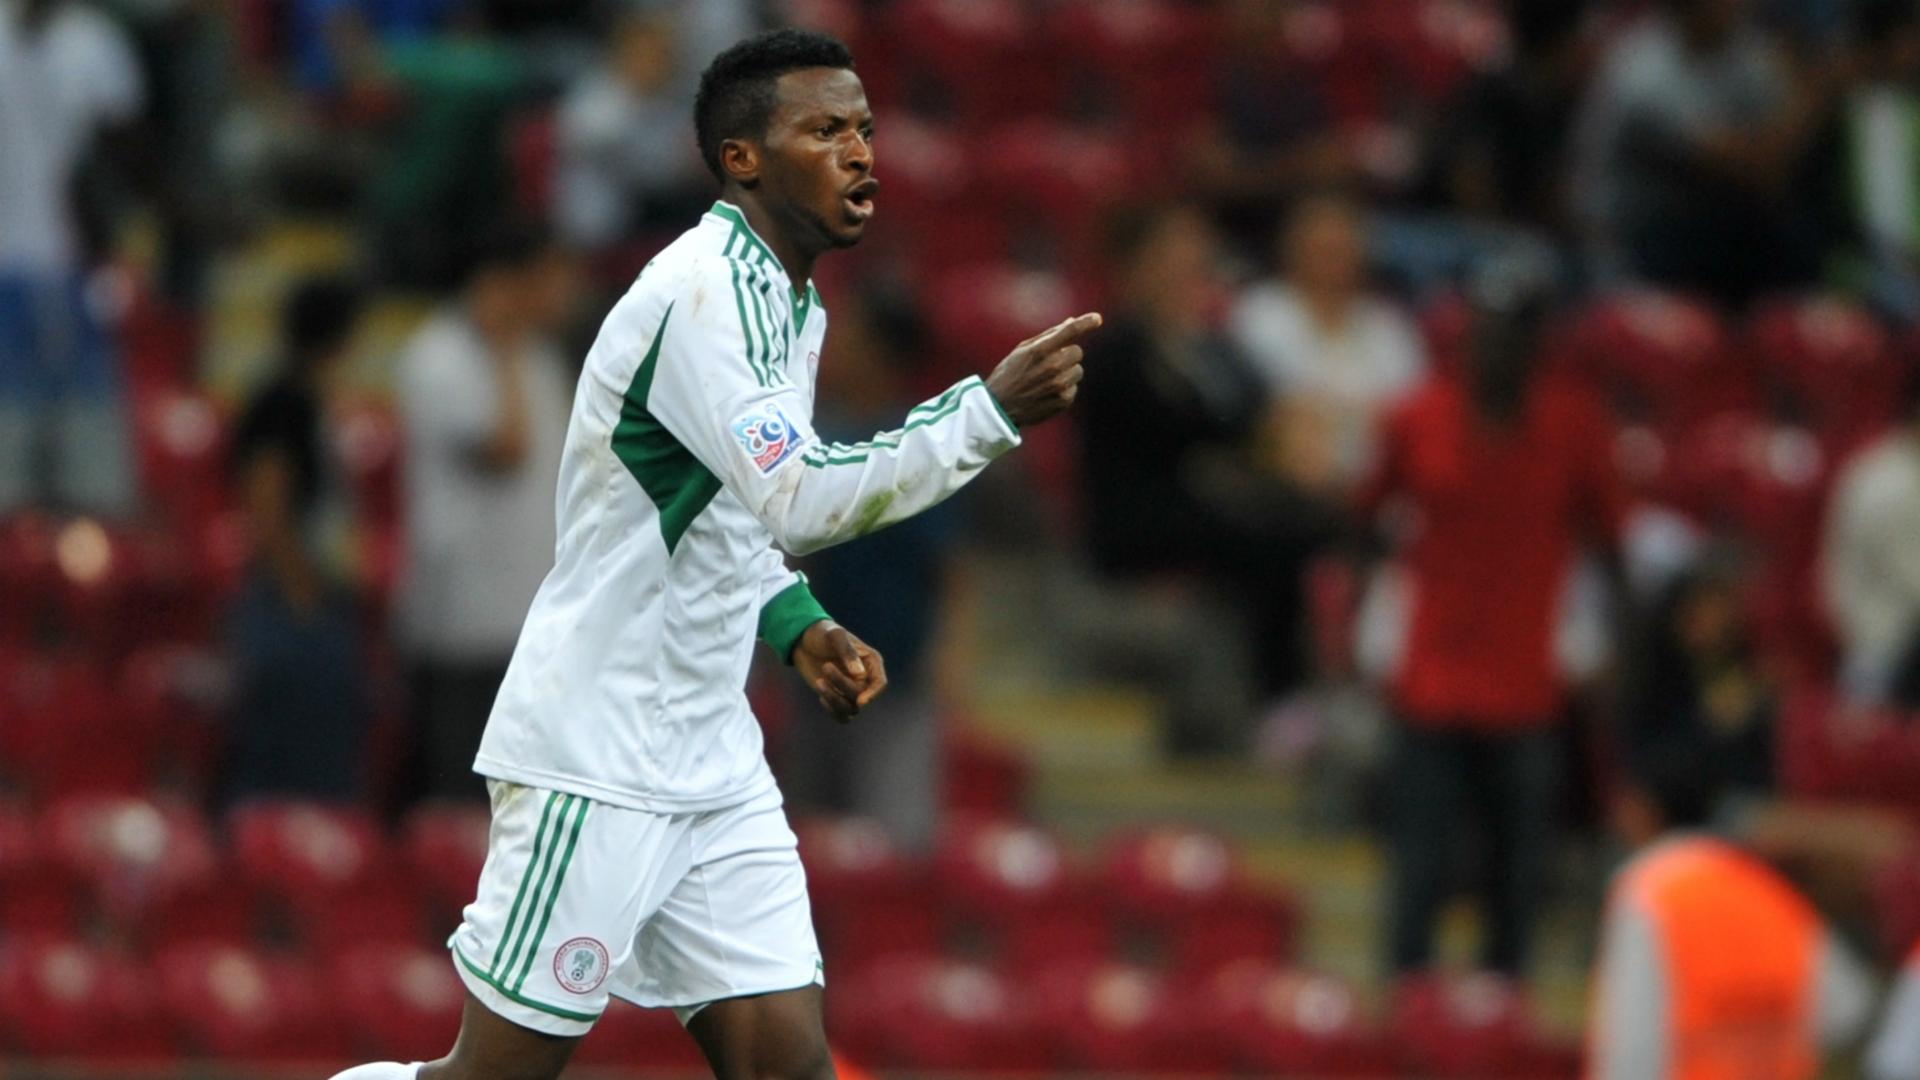 Report: Kayode Olanrewaju signs for Man City